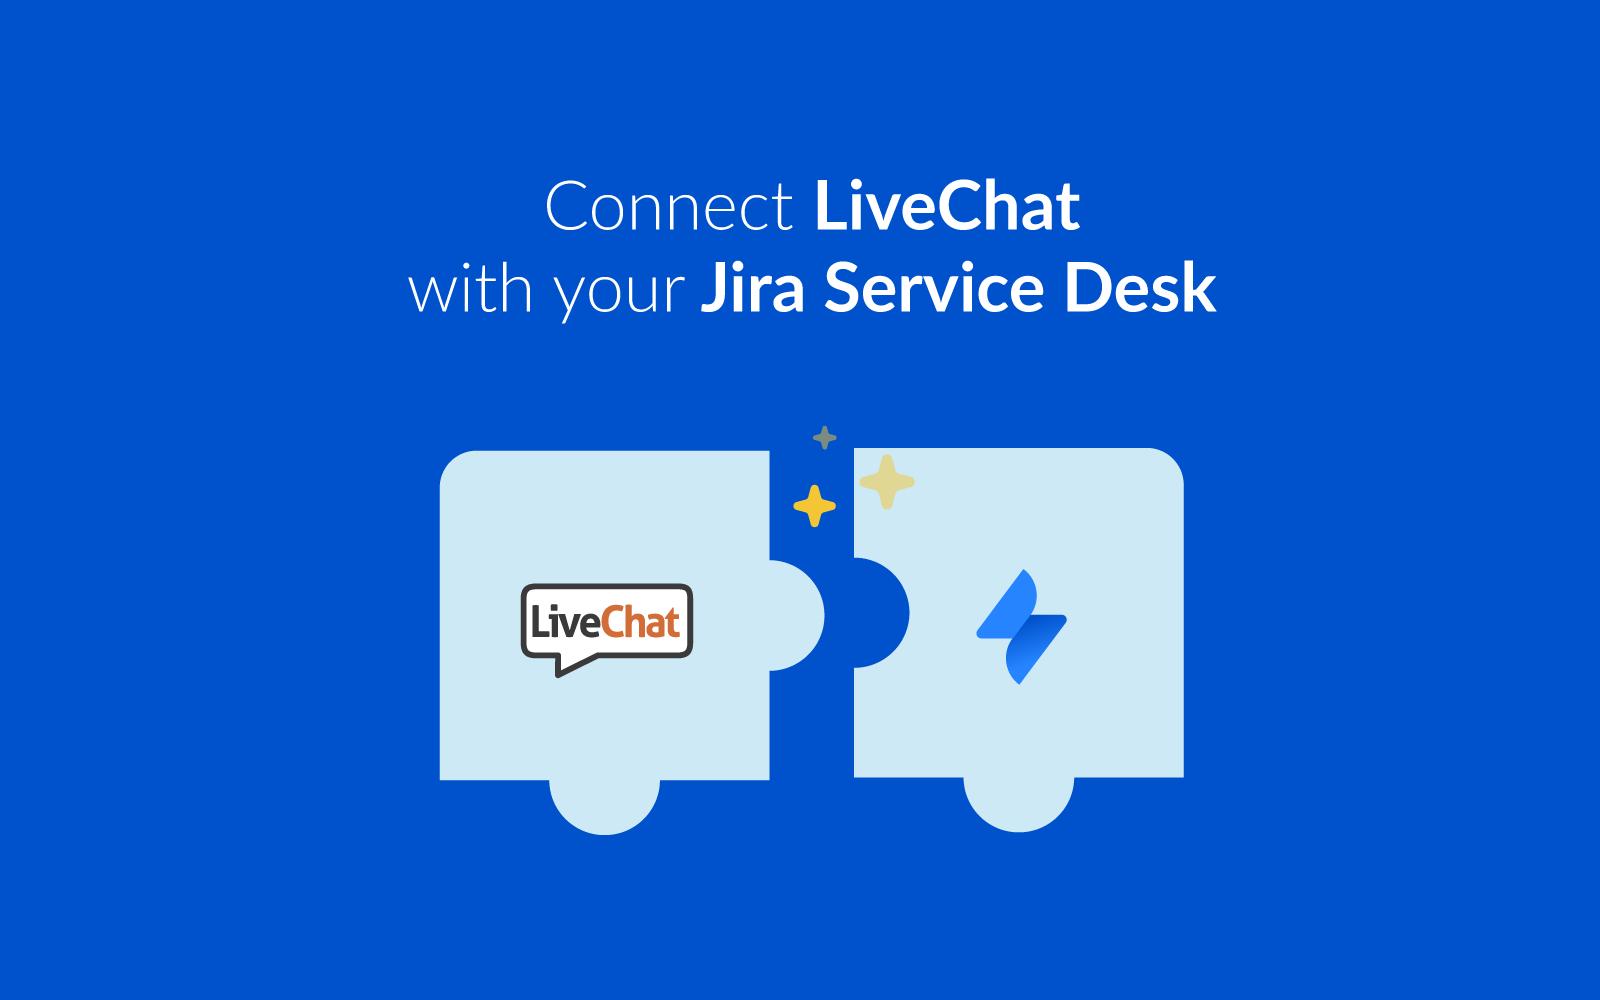 live chat for jira service desk | livechat - jira service desk